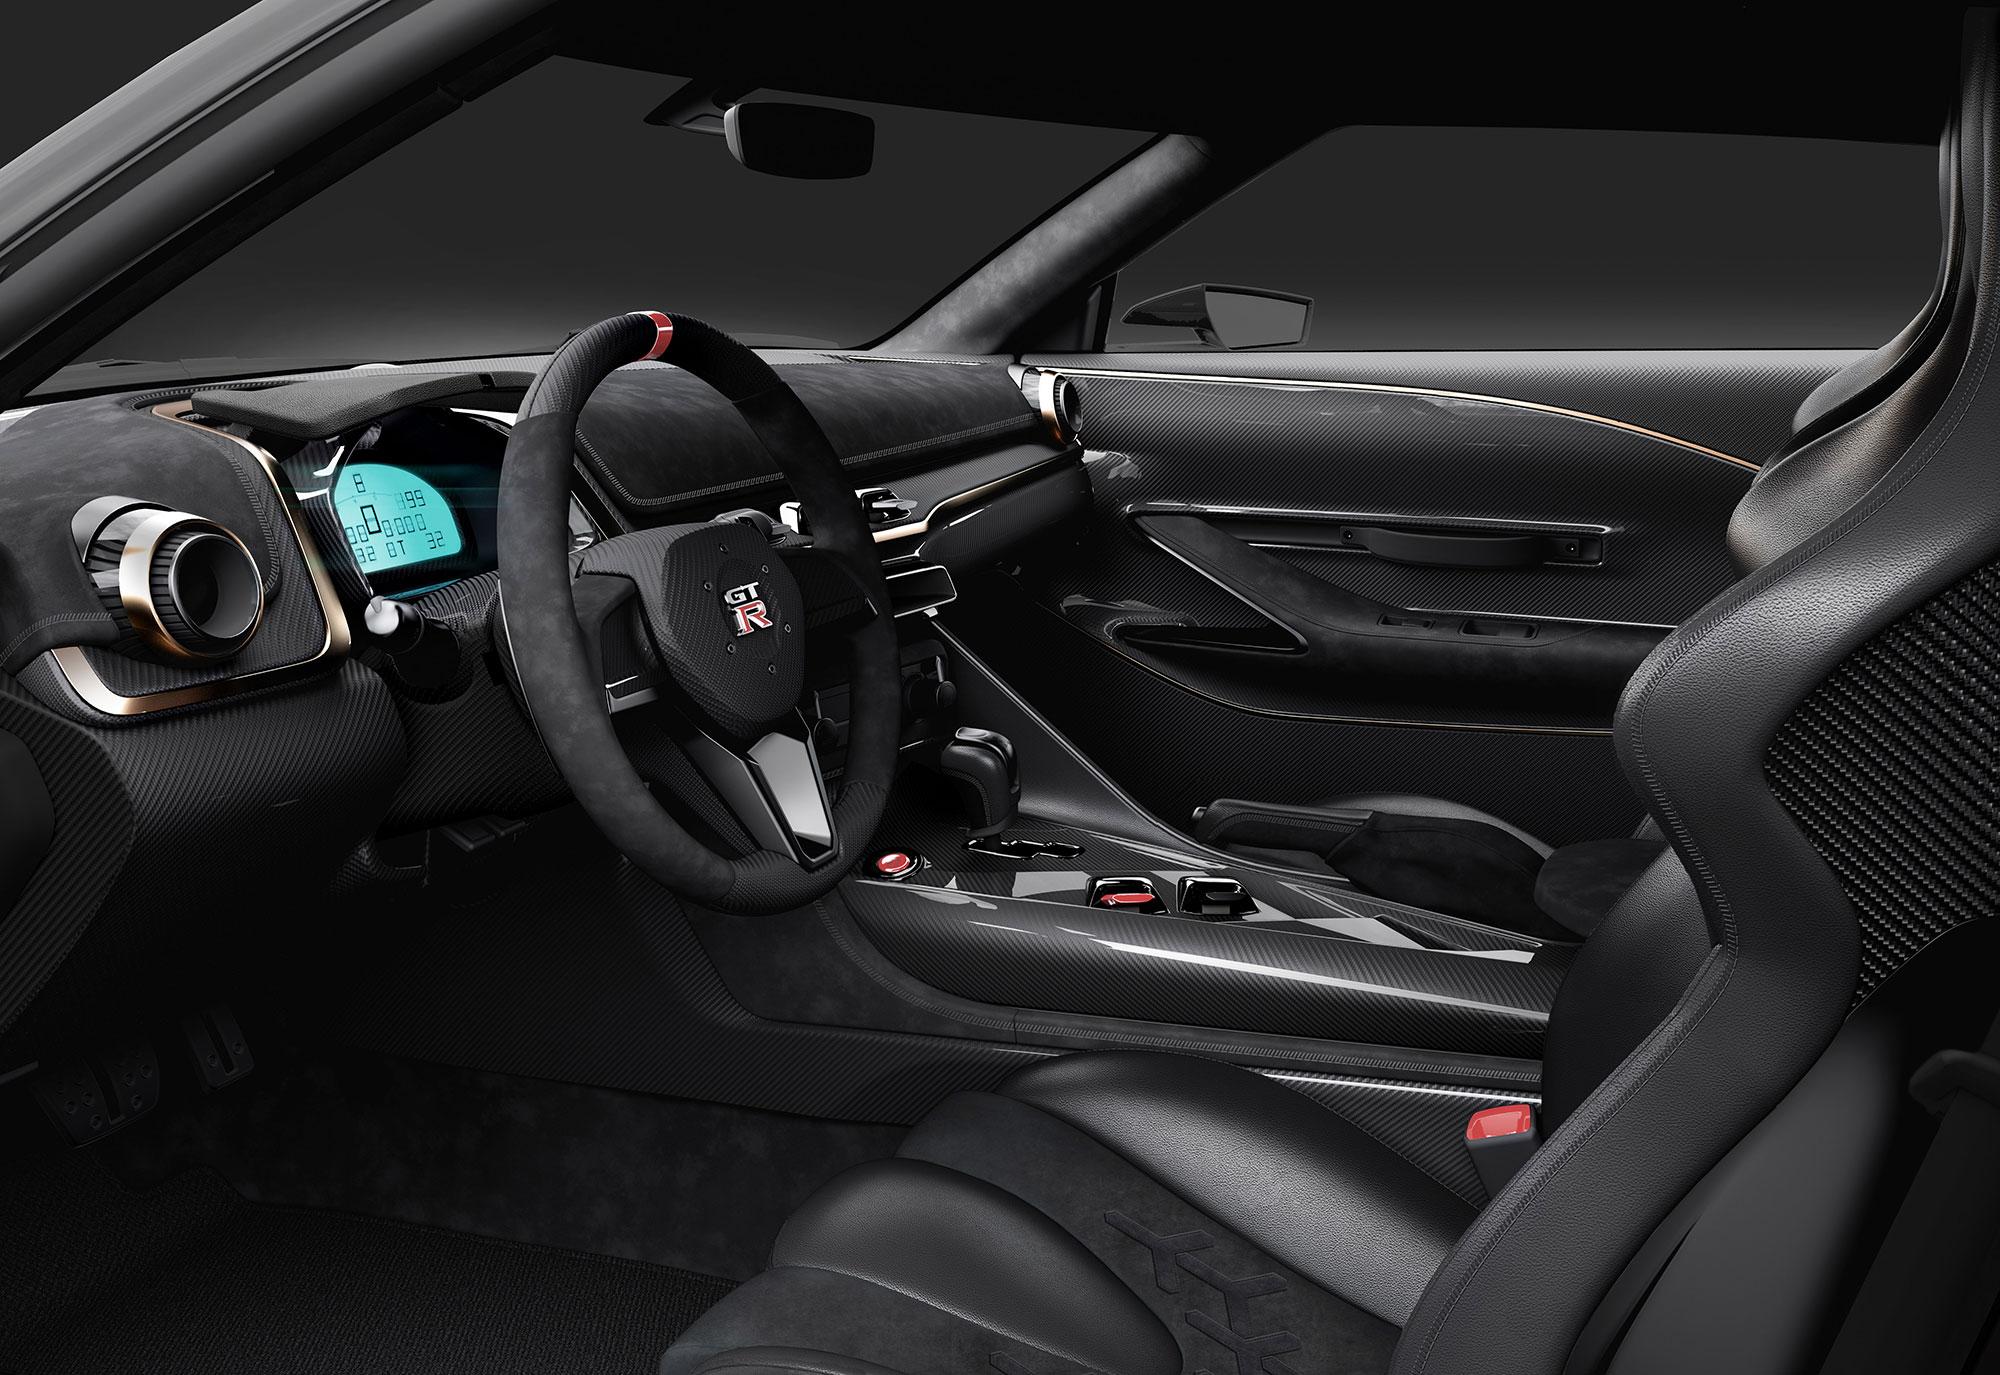 2018-06-25-Nissan-GT-R50-by-Italdesign-INTERIOR-IMAGE-1.jpg